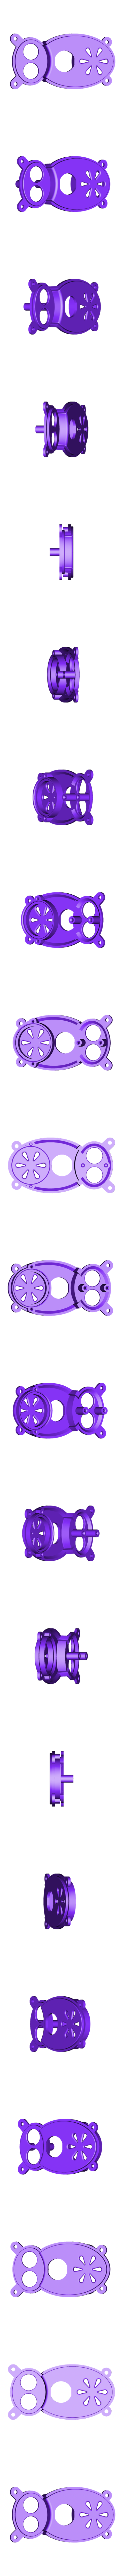 Buttons_6.1.stl Download free STL file Simula 5 Robot Developers Kit • 3D printable model, JamieLaing